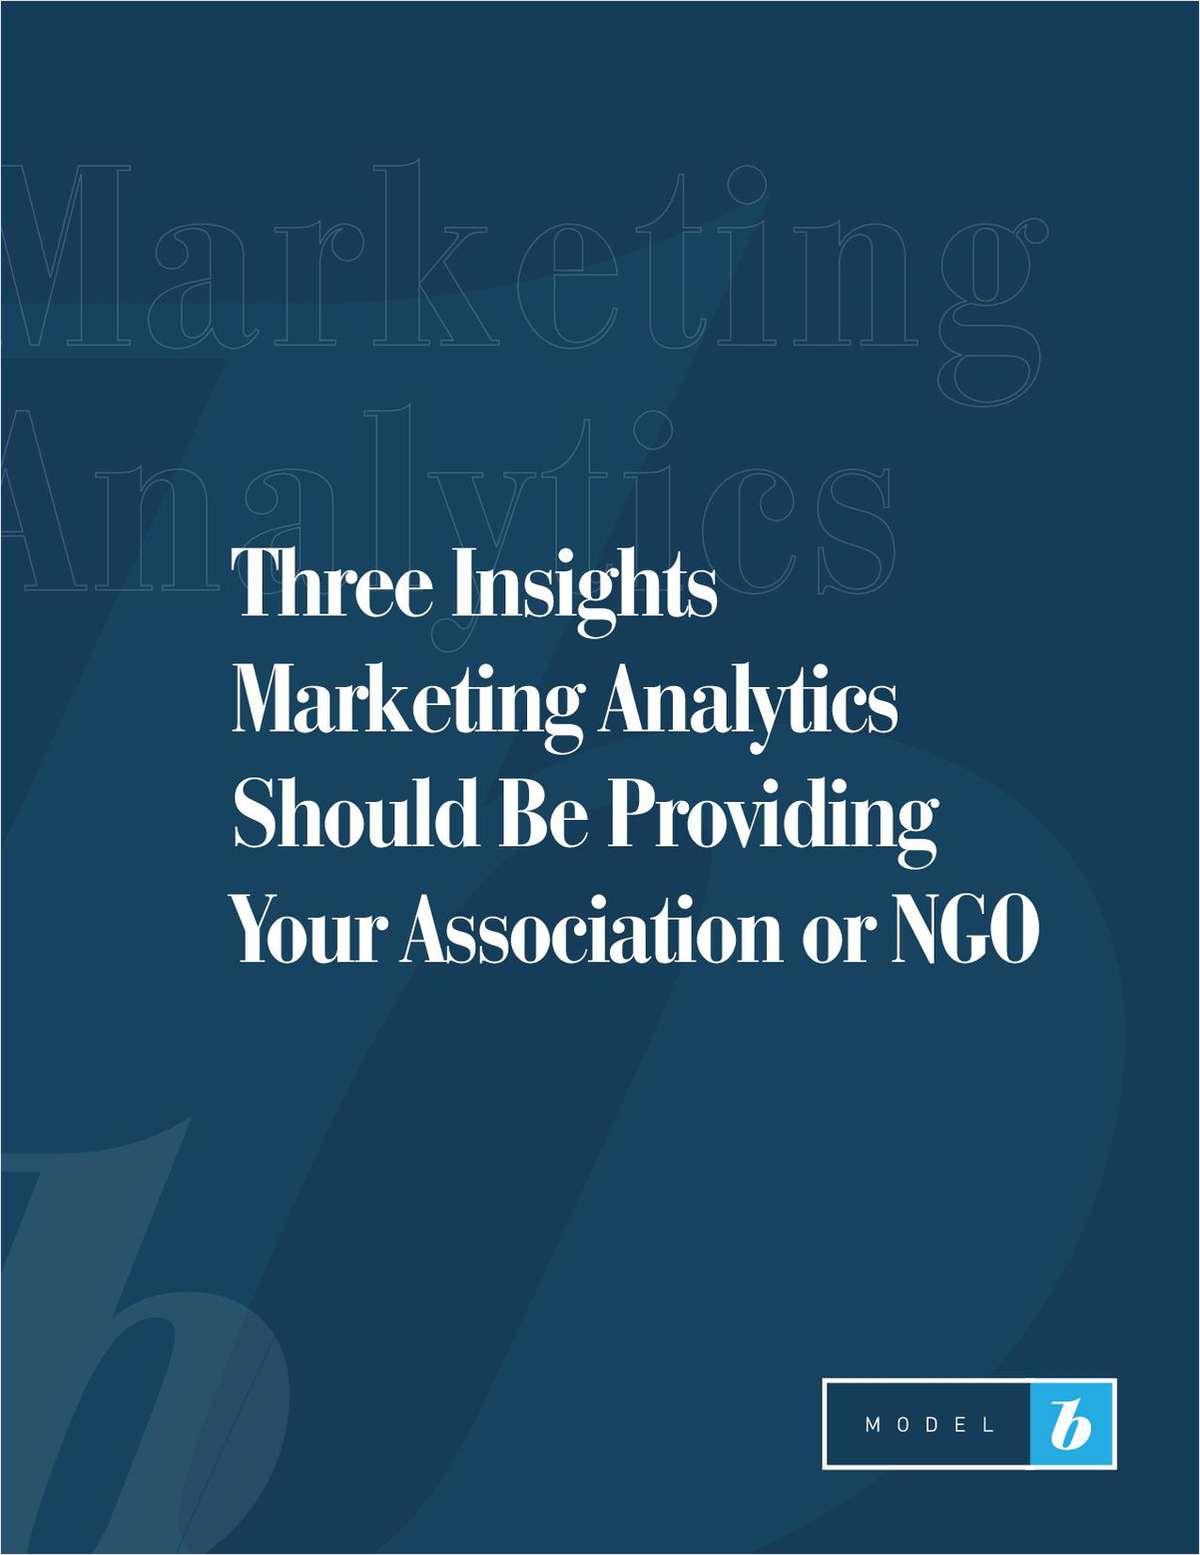 Three Insights Marketing Analytics Should Be Providing Your Association or NGO